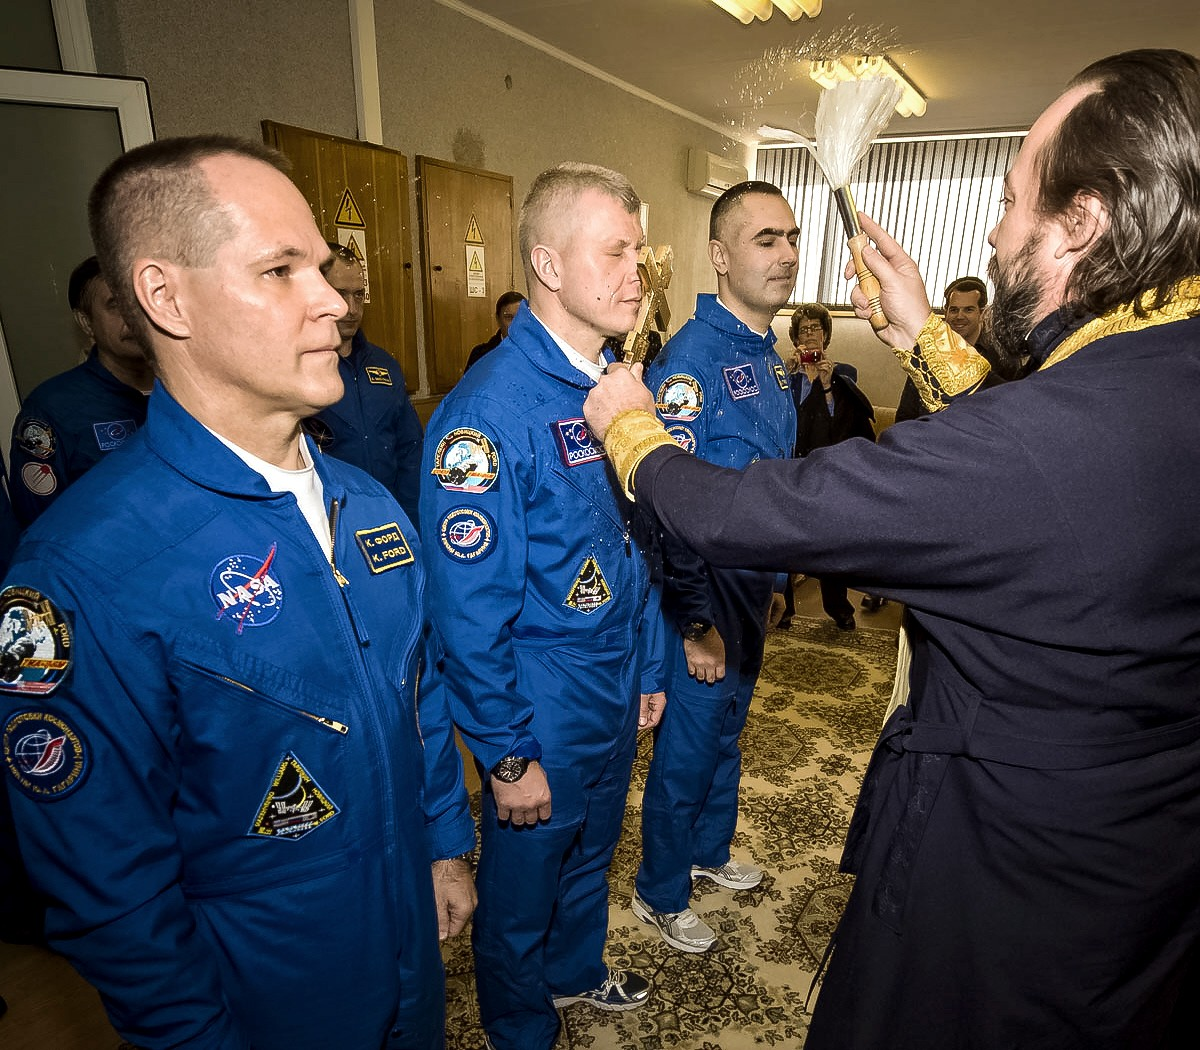 00a ISS crew. 29.10.12. Baikonur